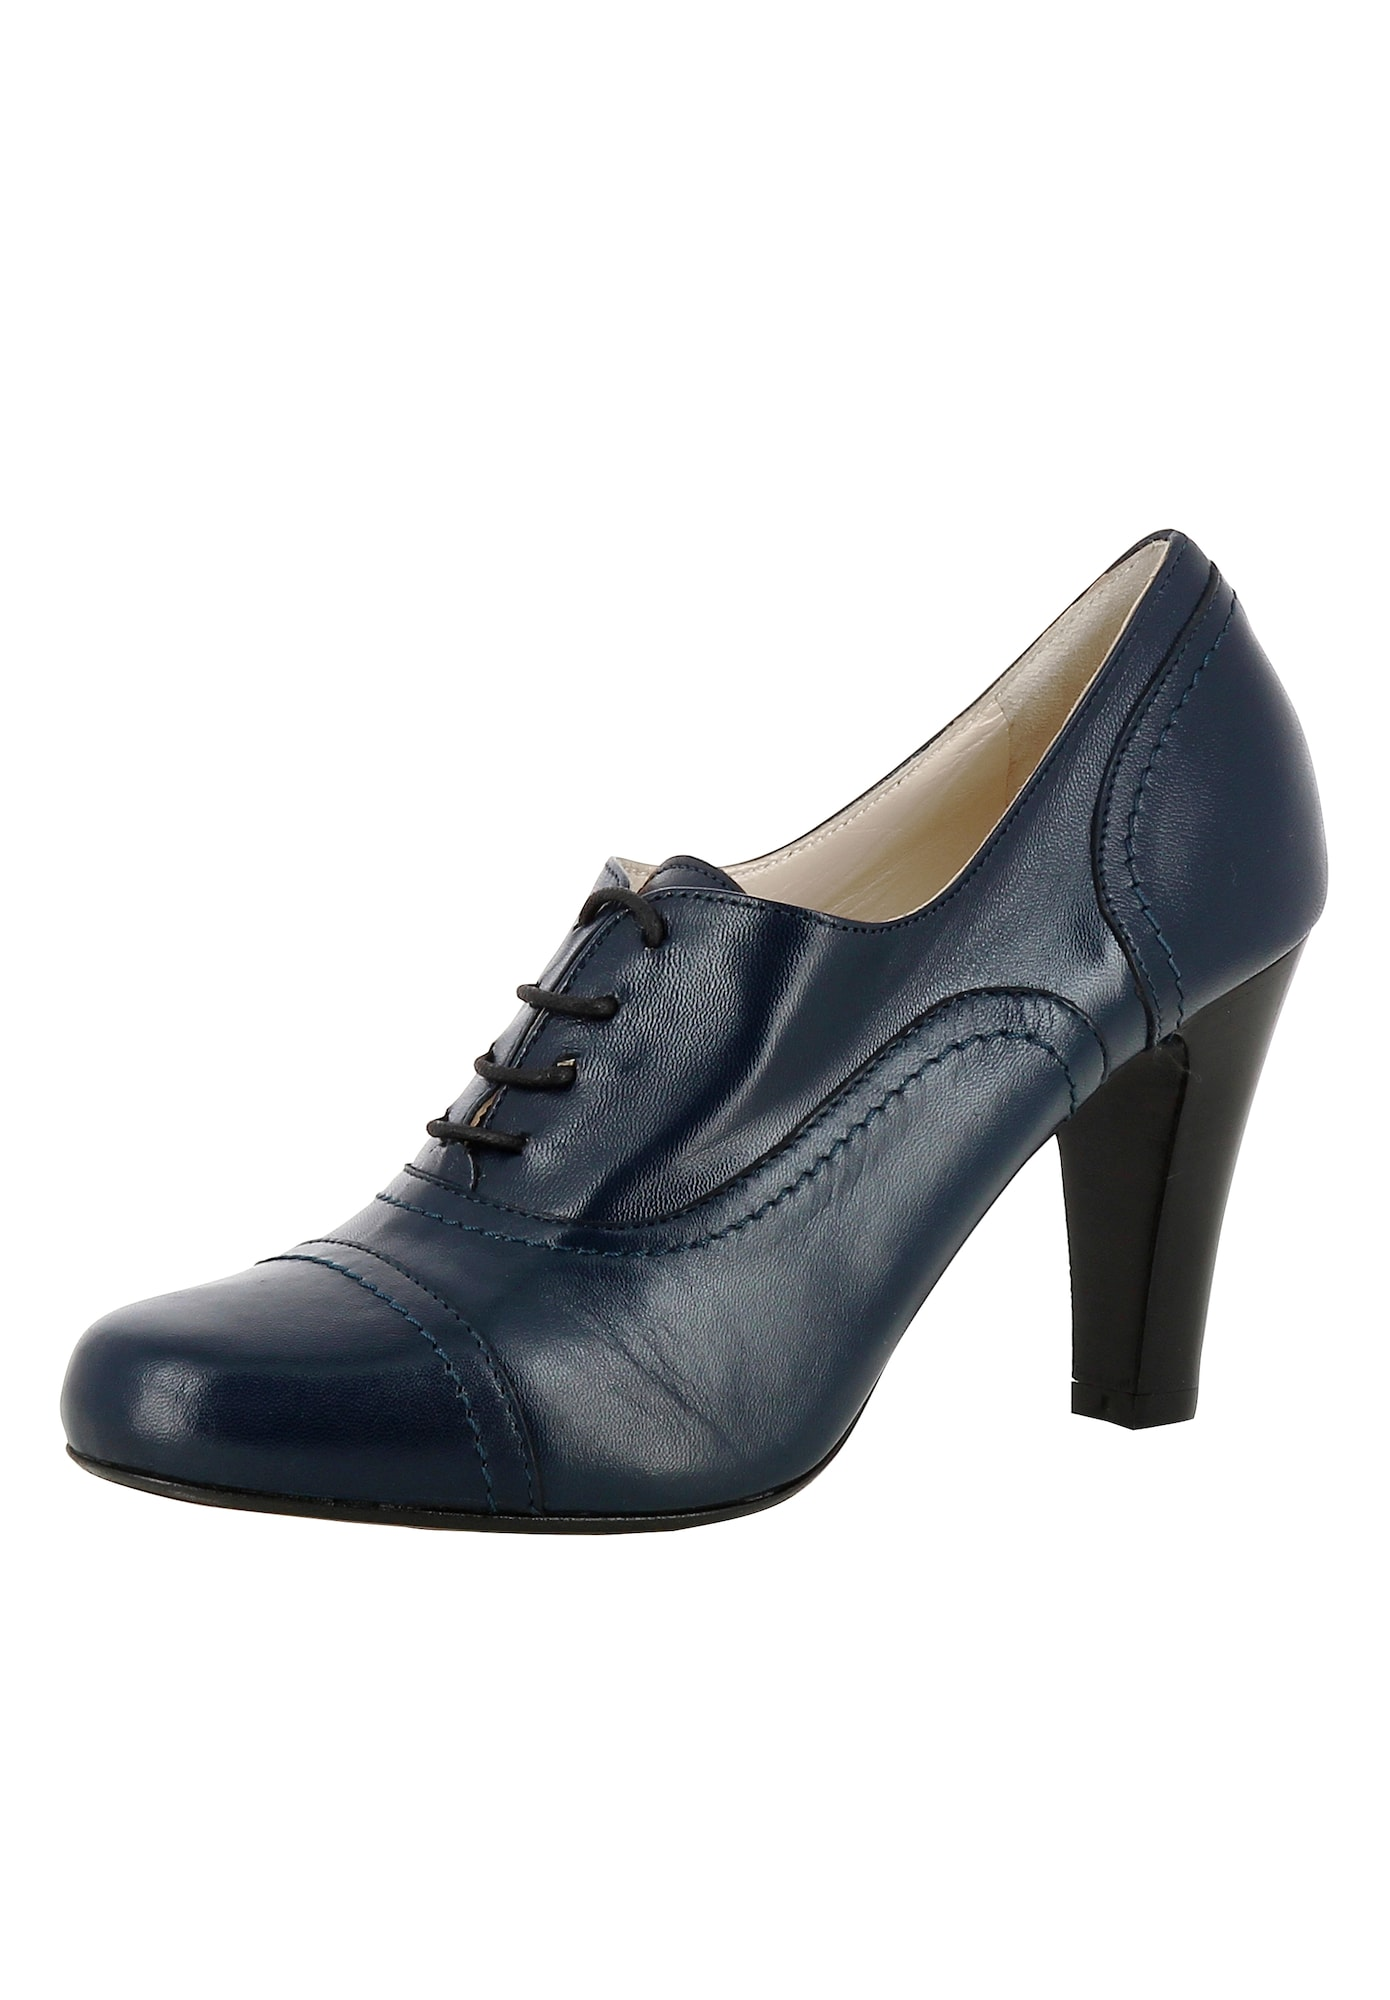 Schnürpumps MARIA | Schuhe > Pumps > Schnürpumps | EVITA